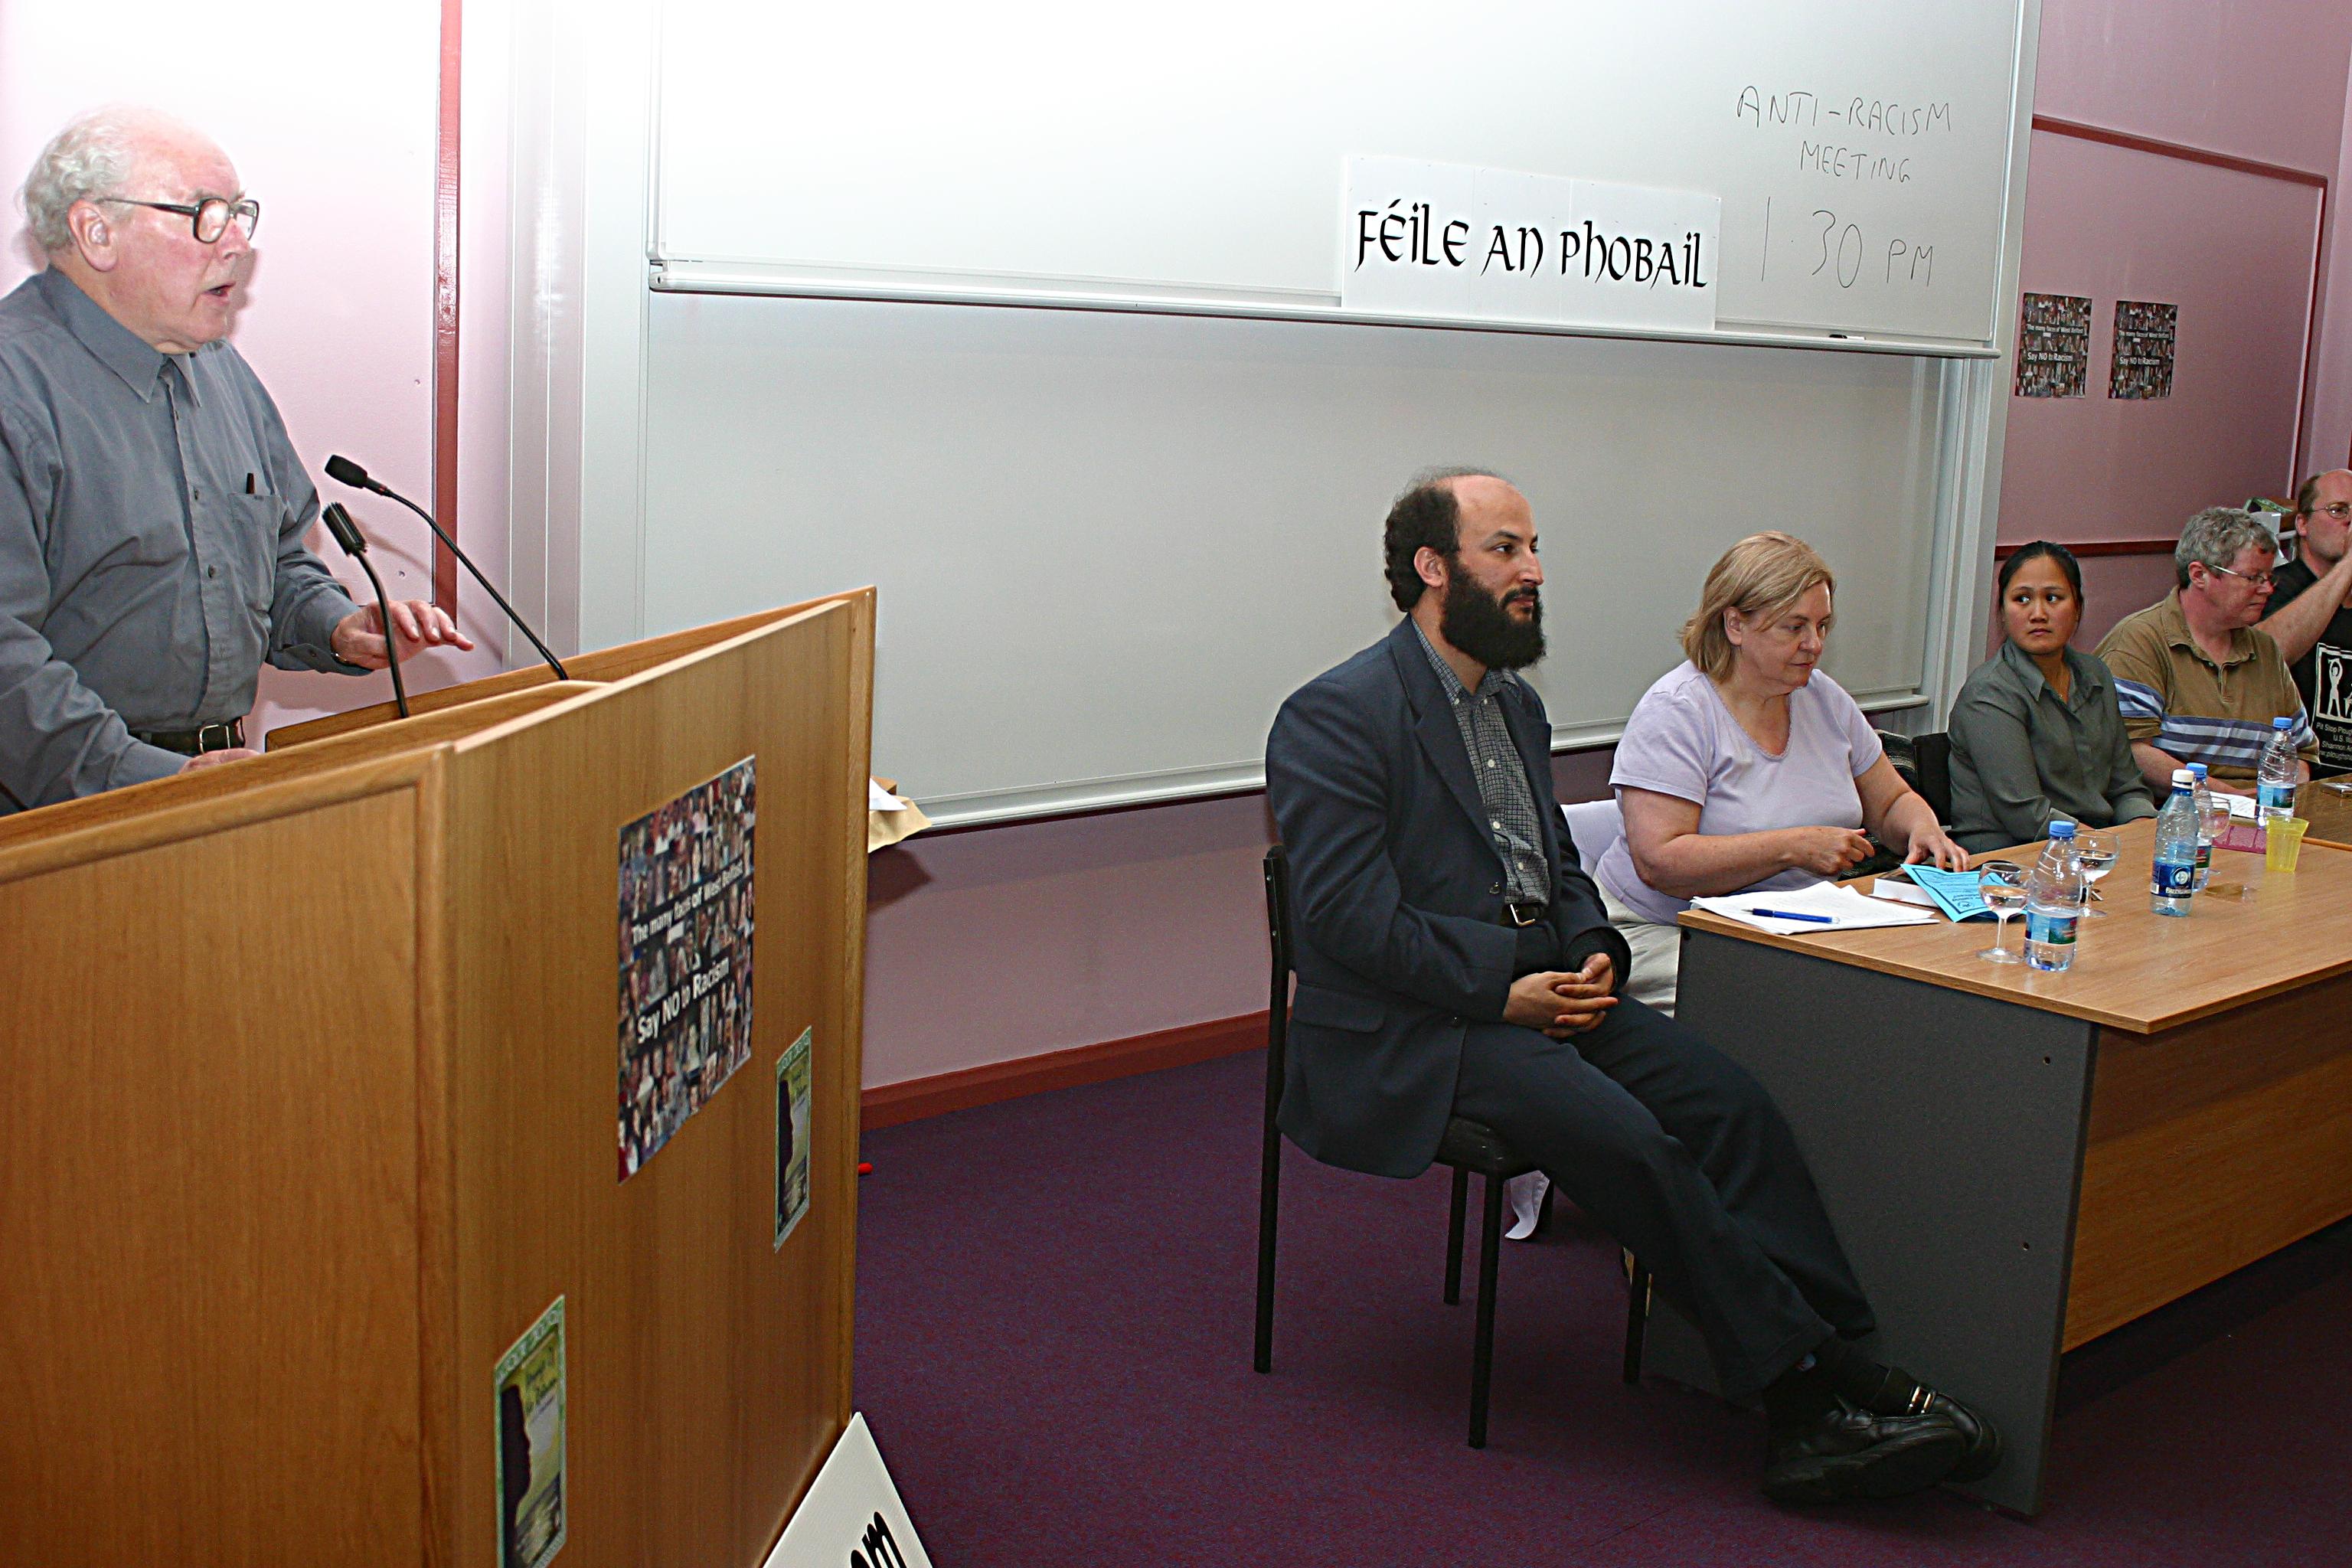 fr-des-wilson-speaking-at-warns-feile-event-july-2004_0